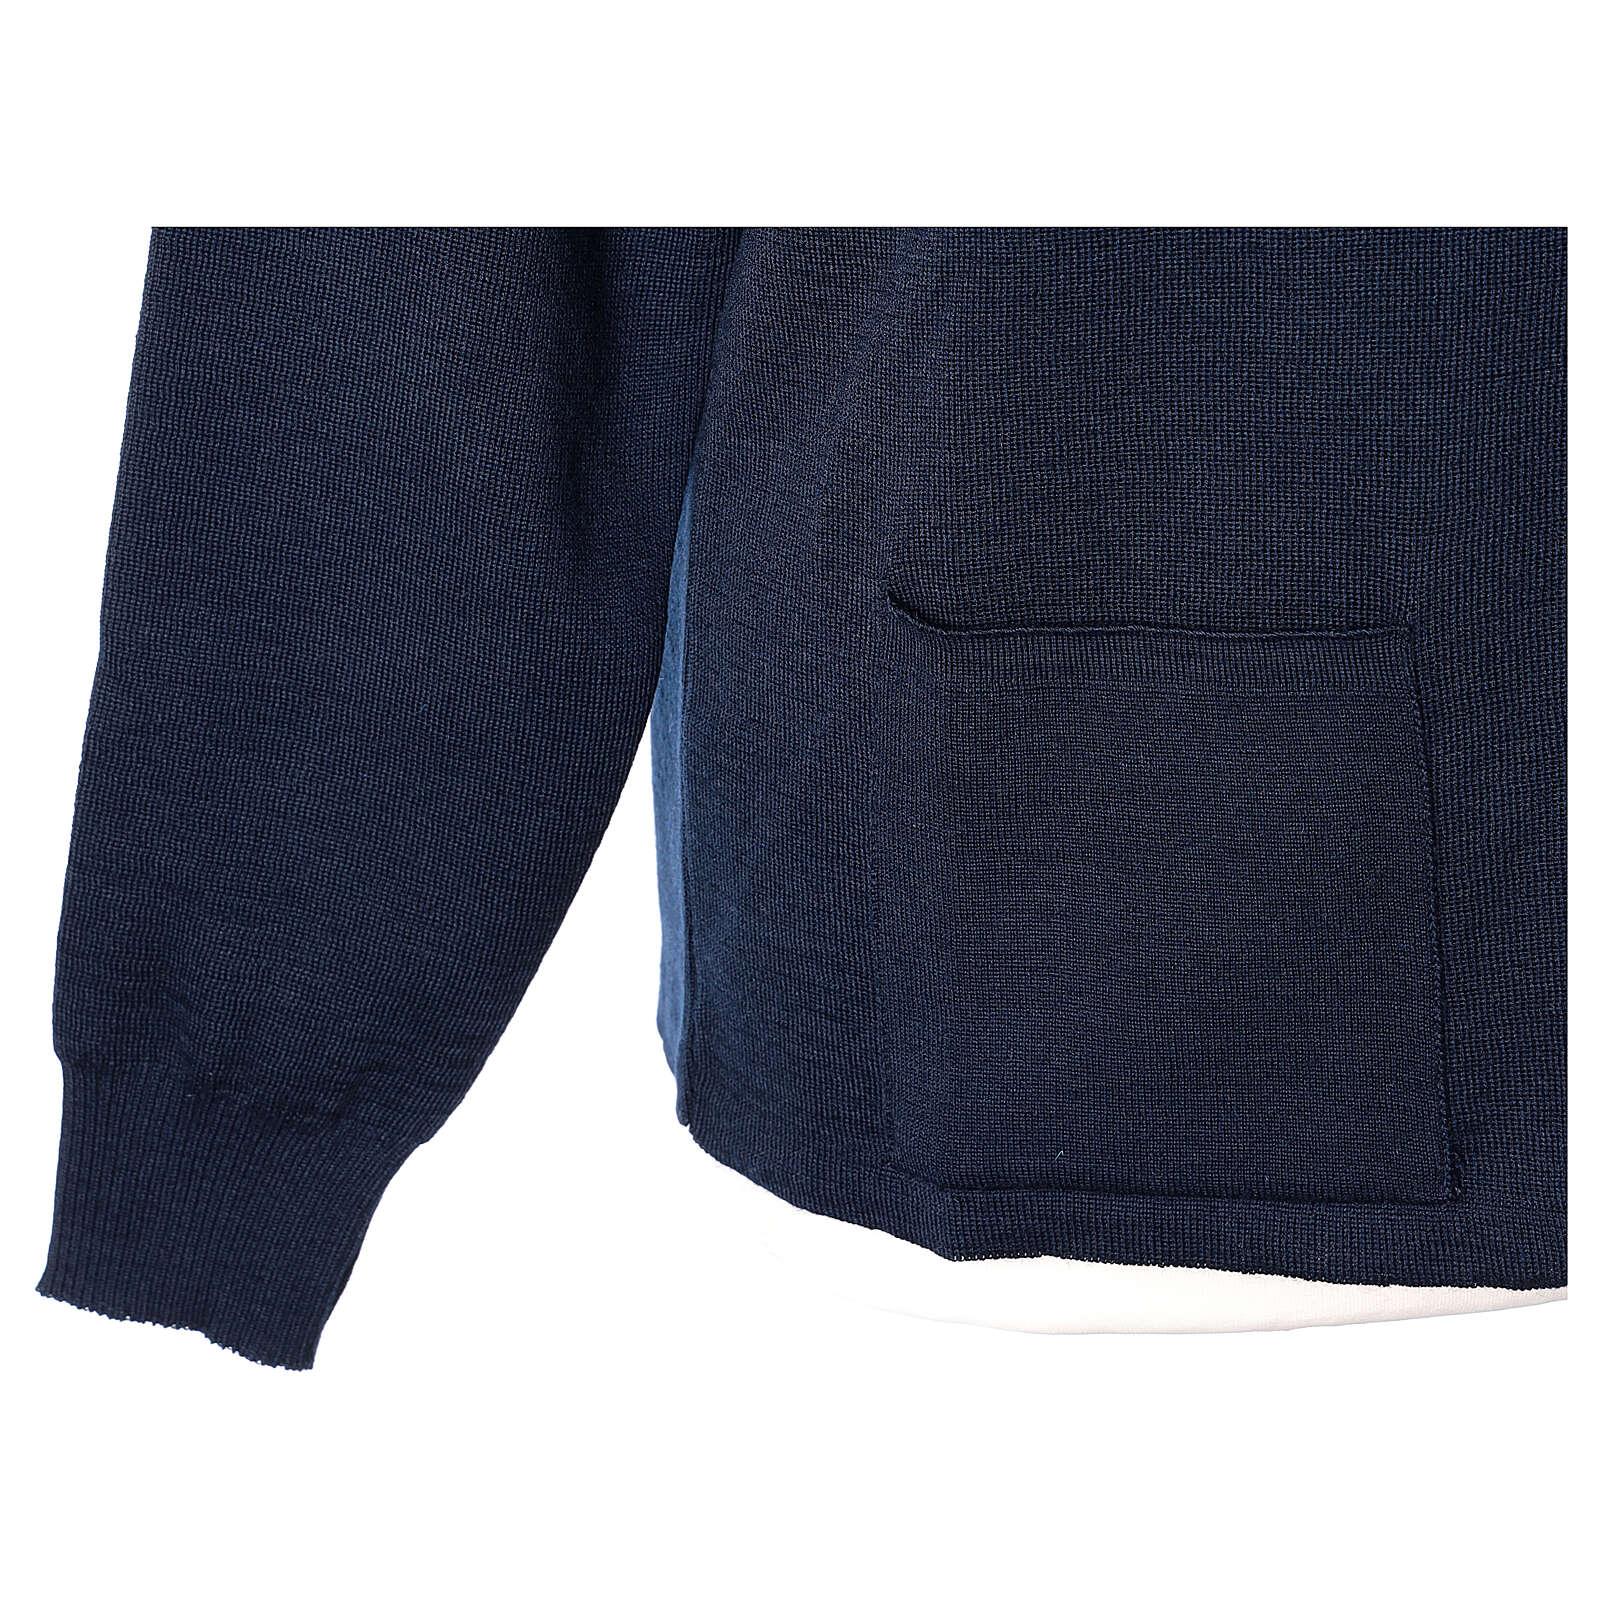 Chaqueta coreana con cremallera 50% acrílico 50% lana merina azul monja In Primis 4